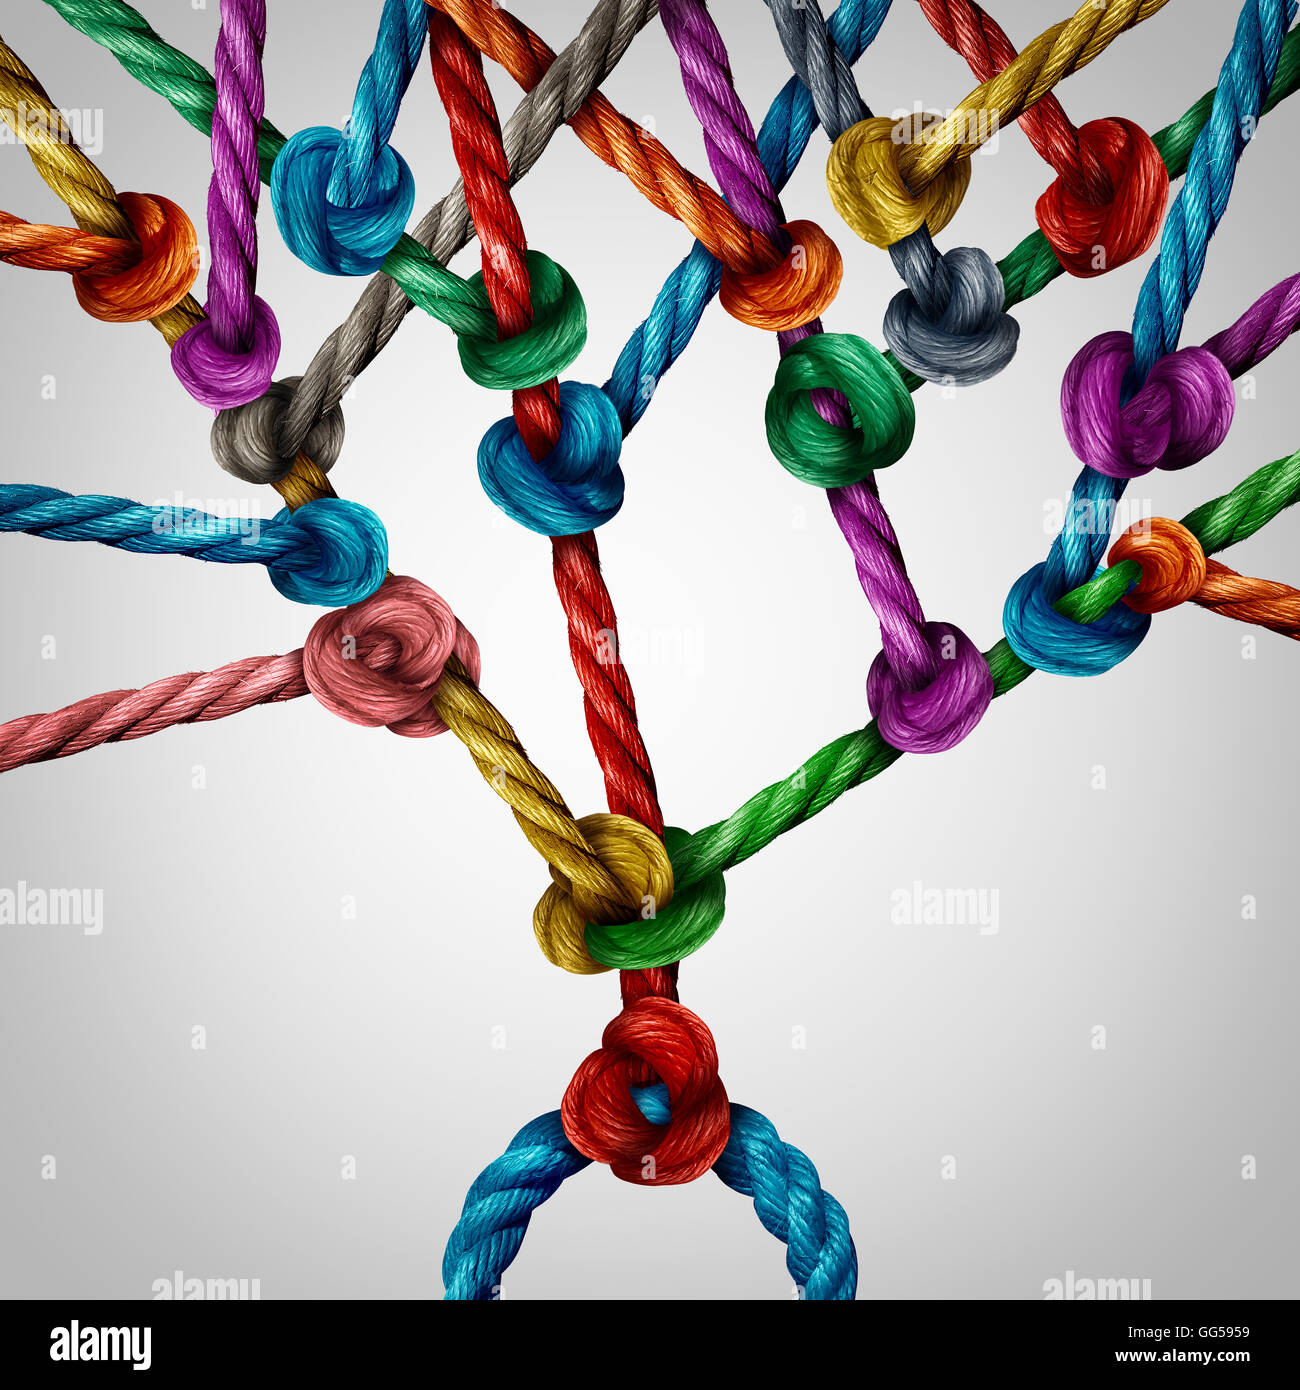 Árbol de red conexión conectados como un grupo de cuerdas atadas juntas como un crecimiento estructura ramificada. Foto de stock